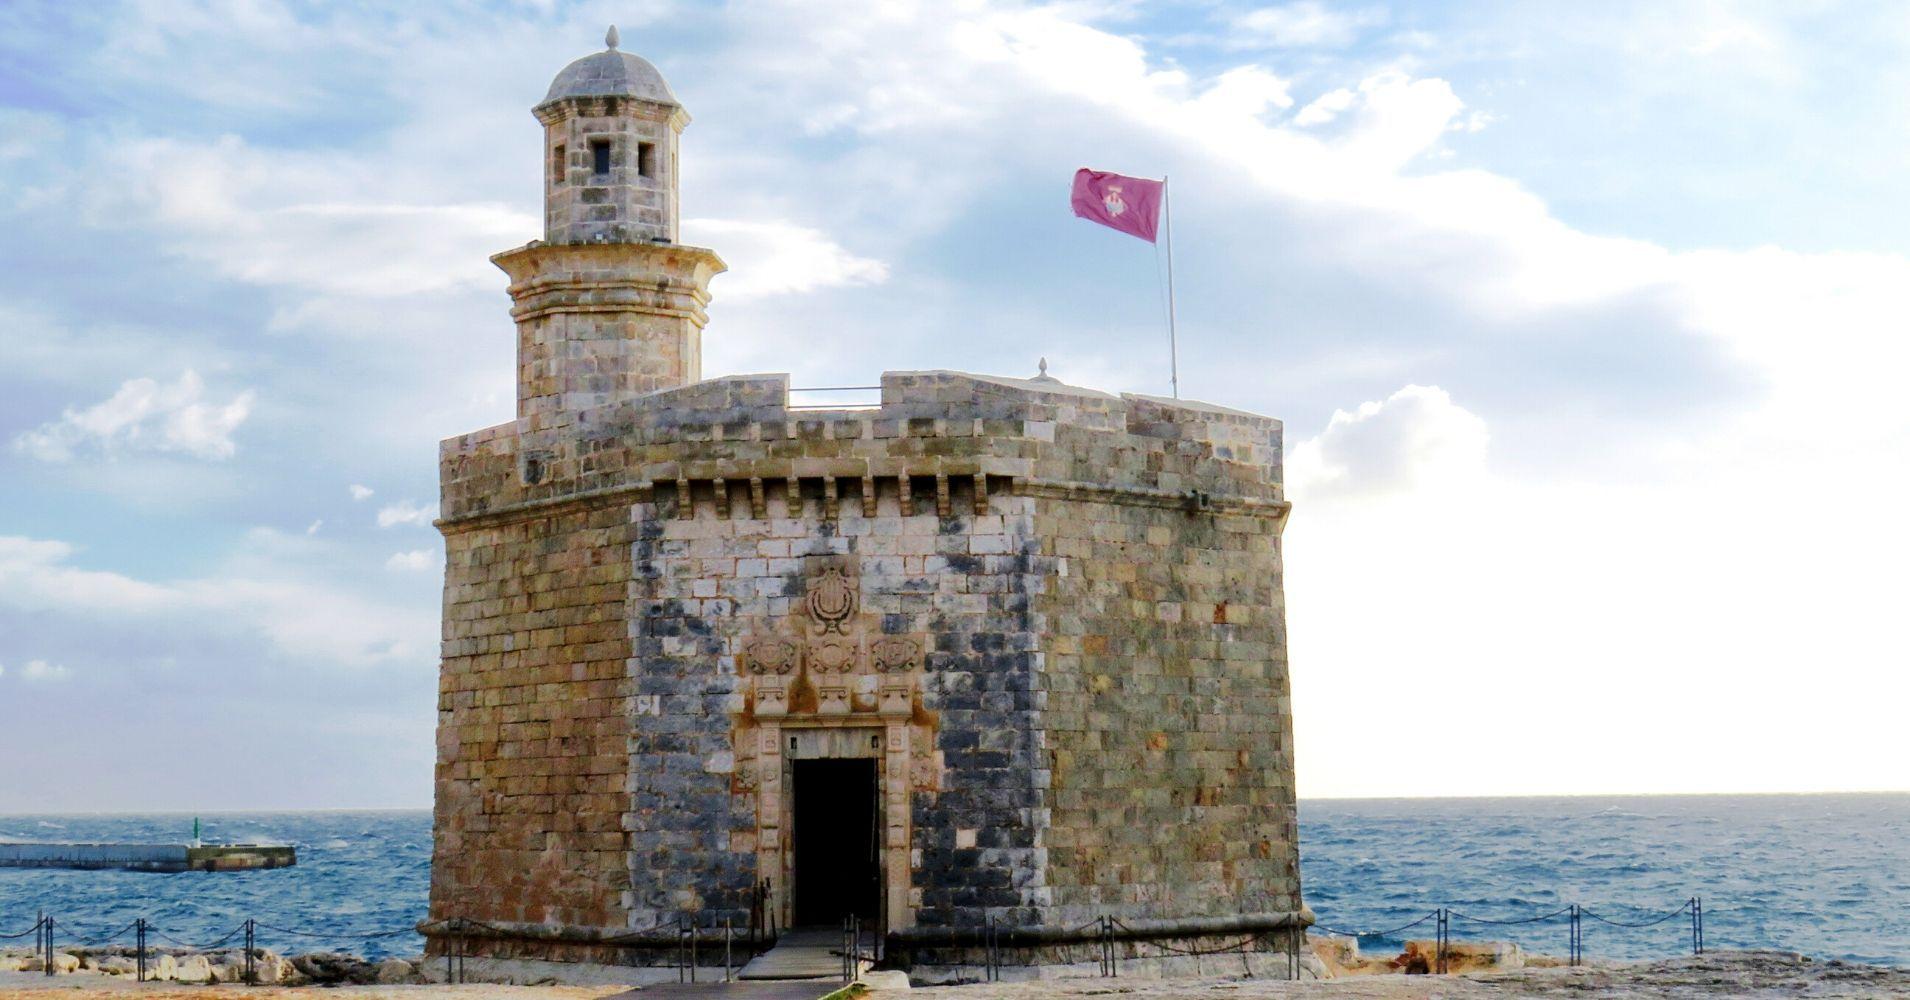 Castillo de Sant Nicolau, Menorca. Islas Baleares.